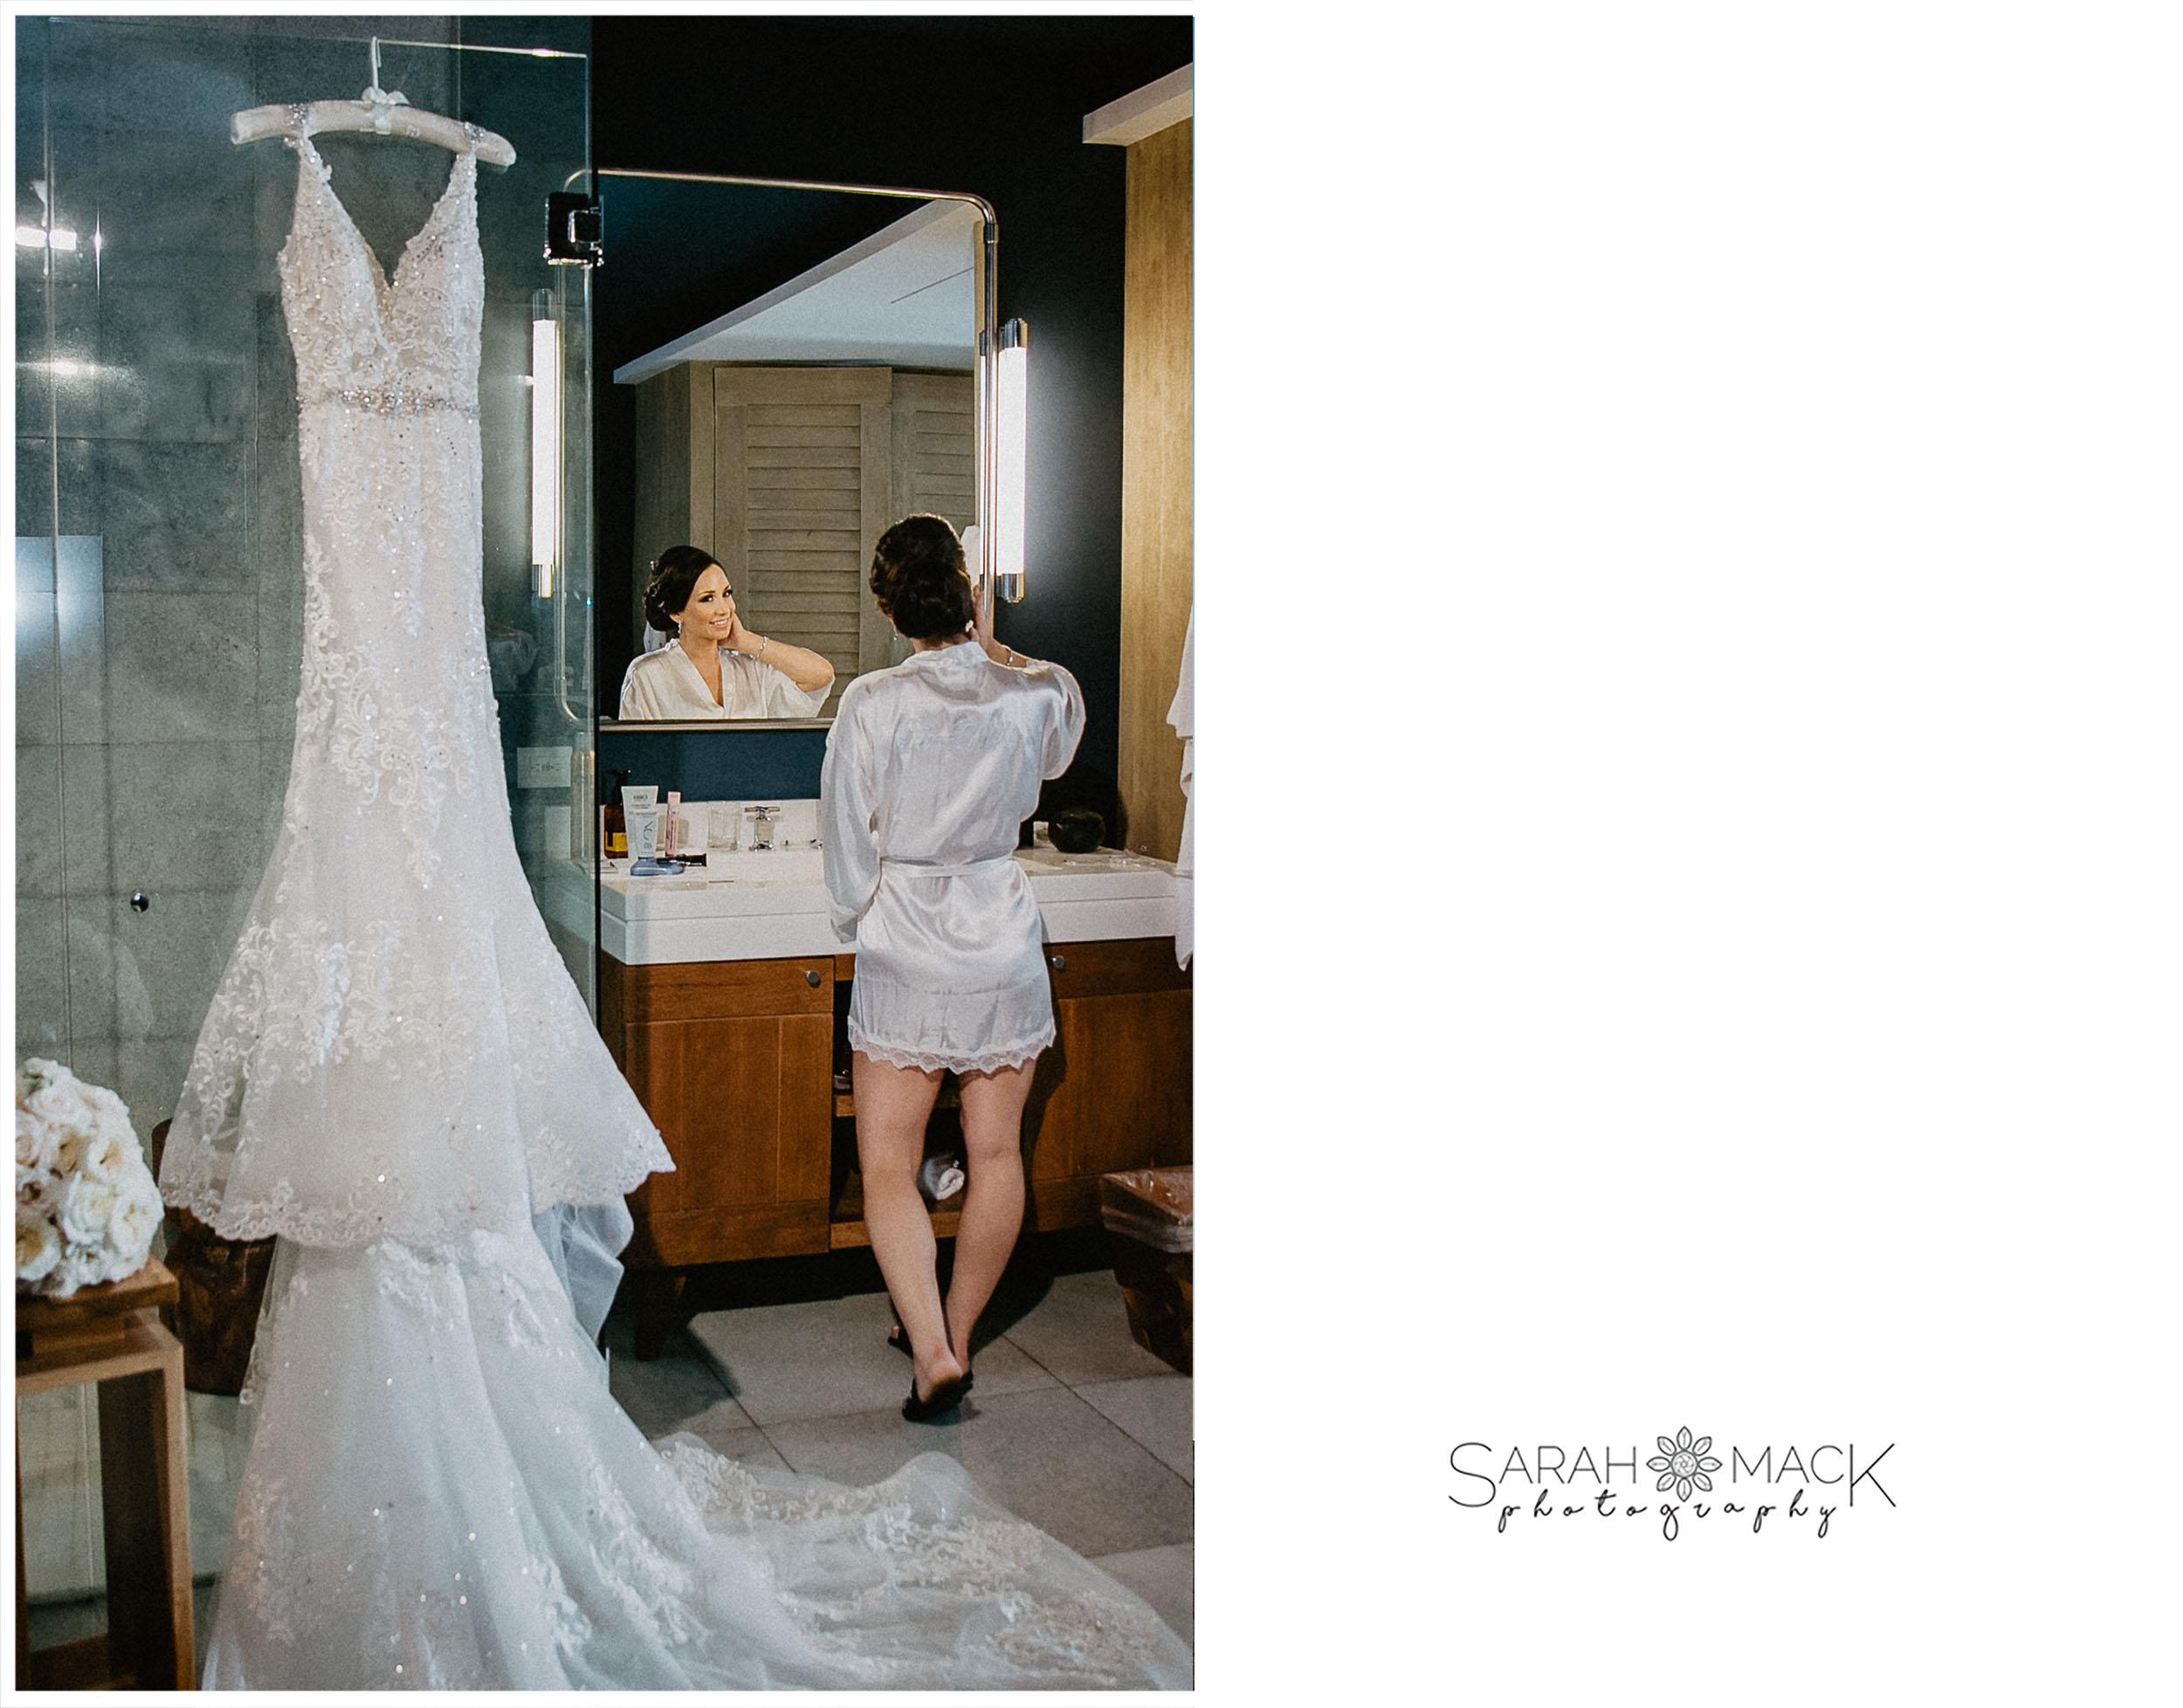 LJ-The-Cape-Hotel-Cabo-San-Lucas-Wedding-10.jpg